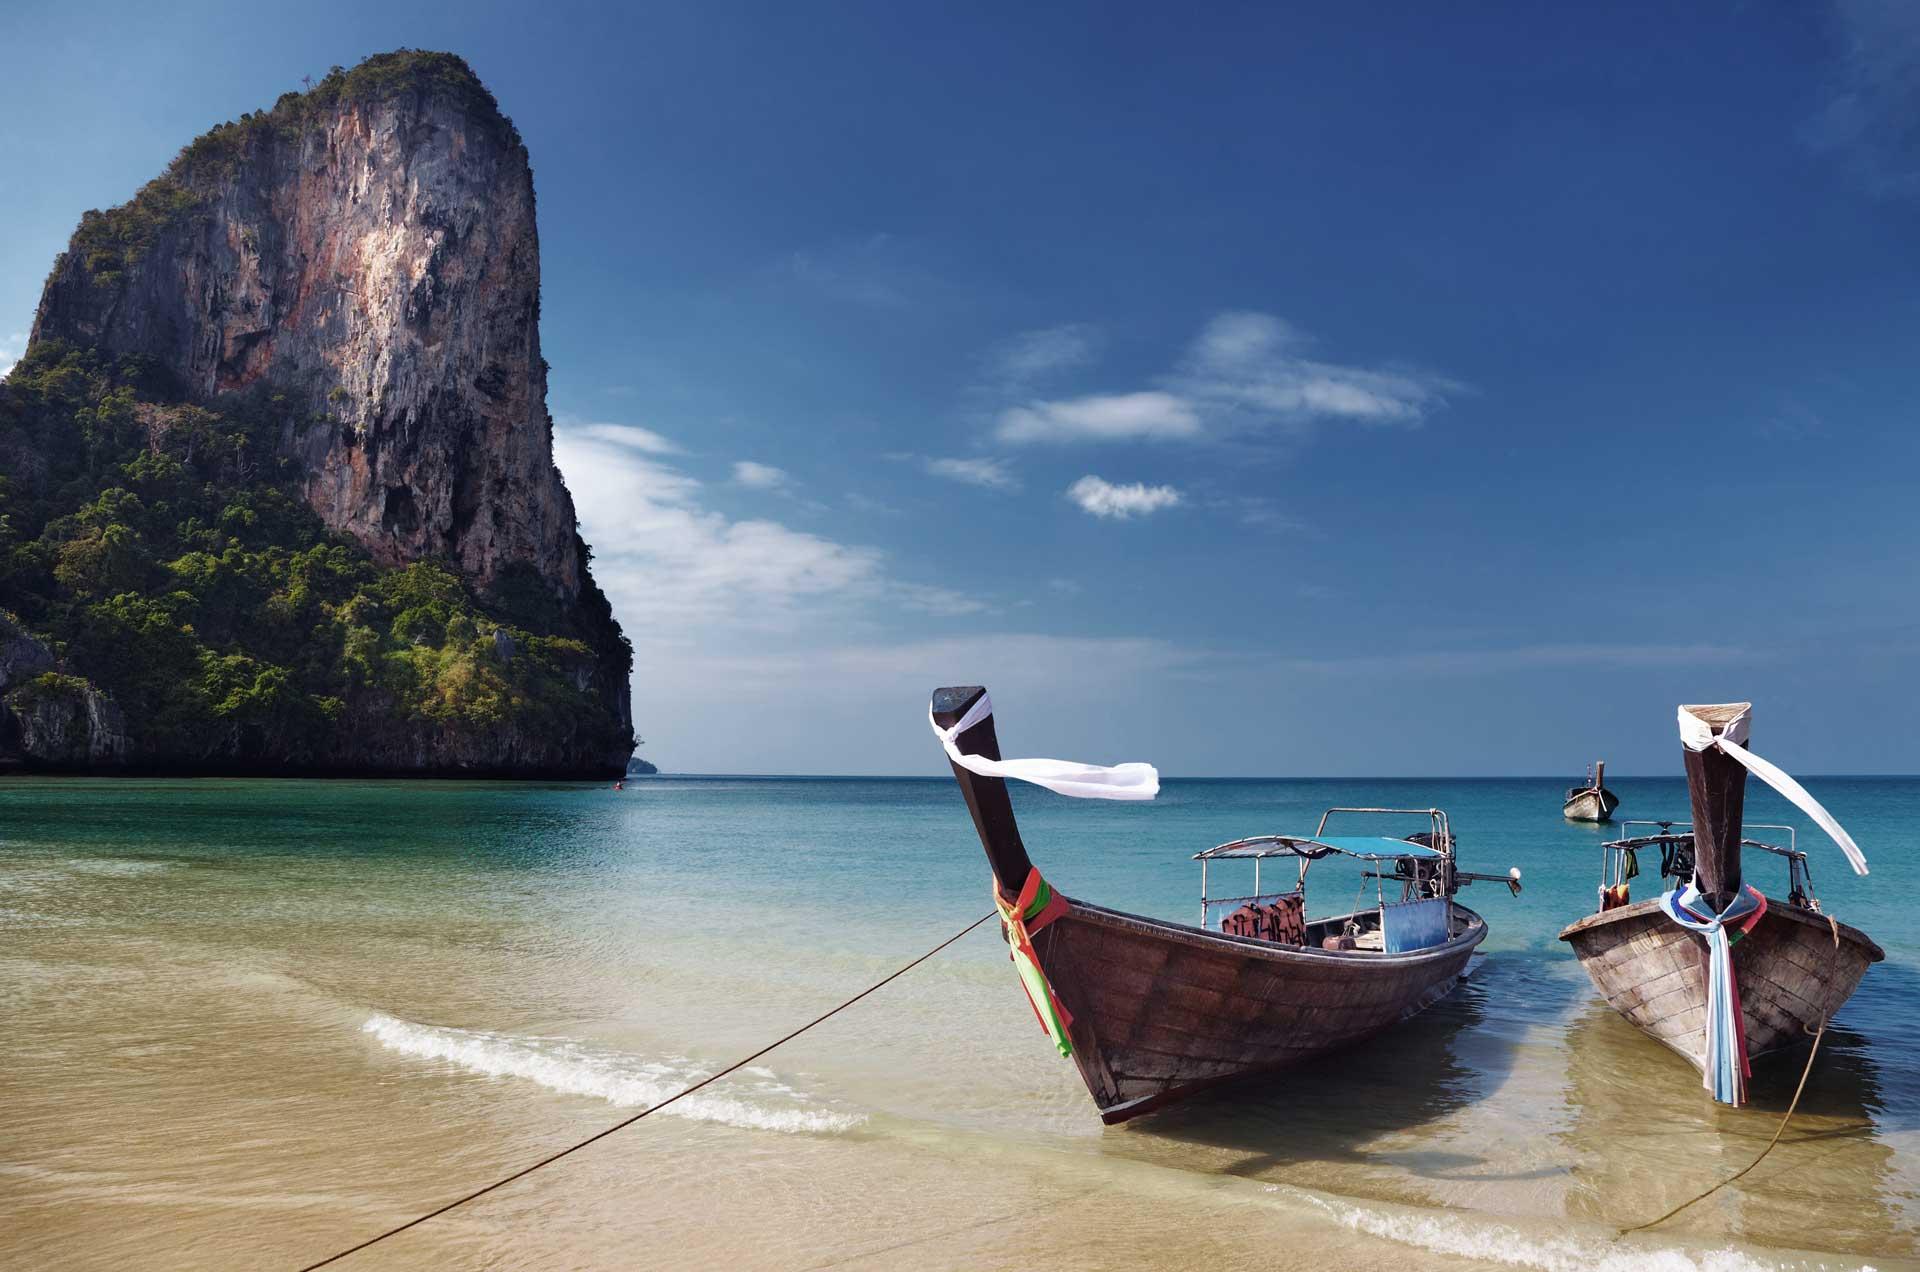 Beautiful Sea imagination. I want to live and love!